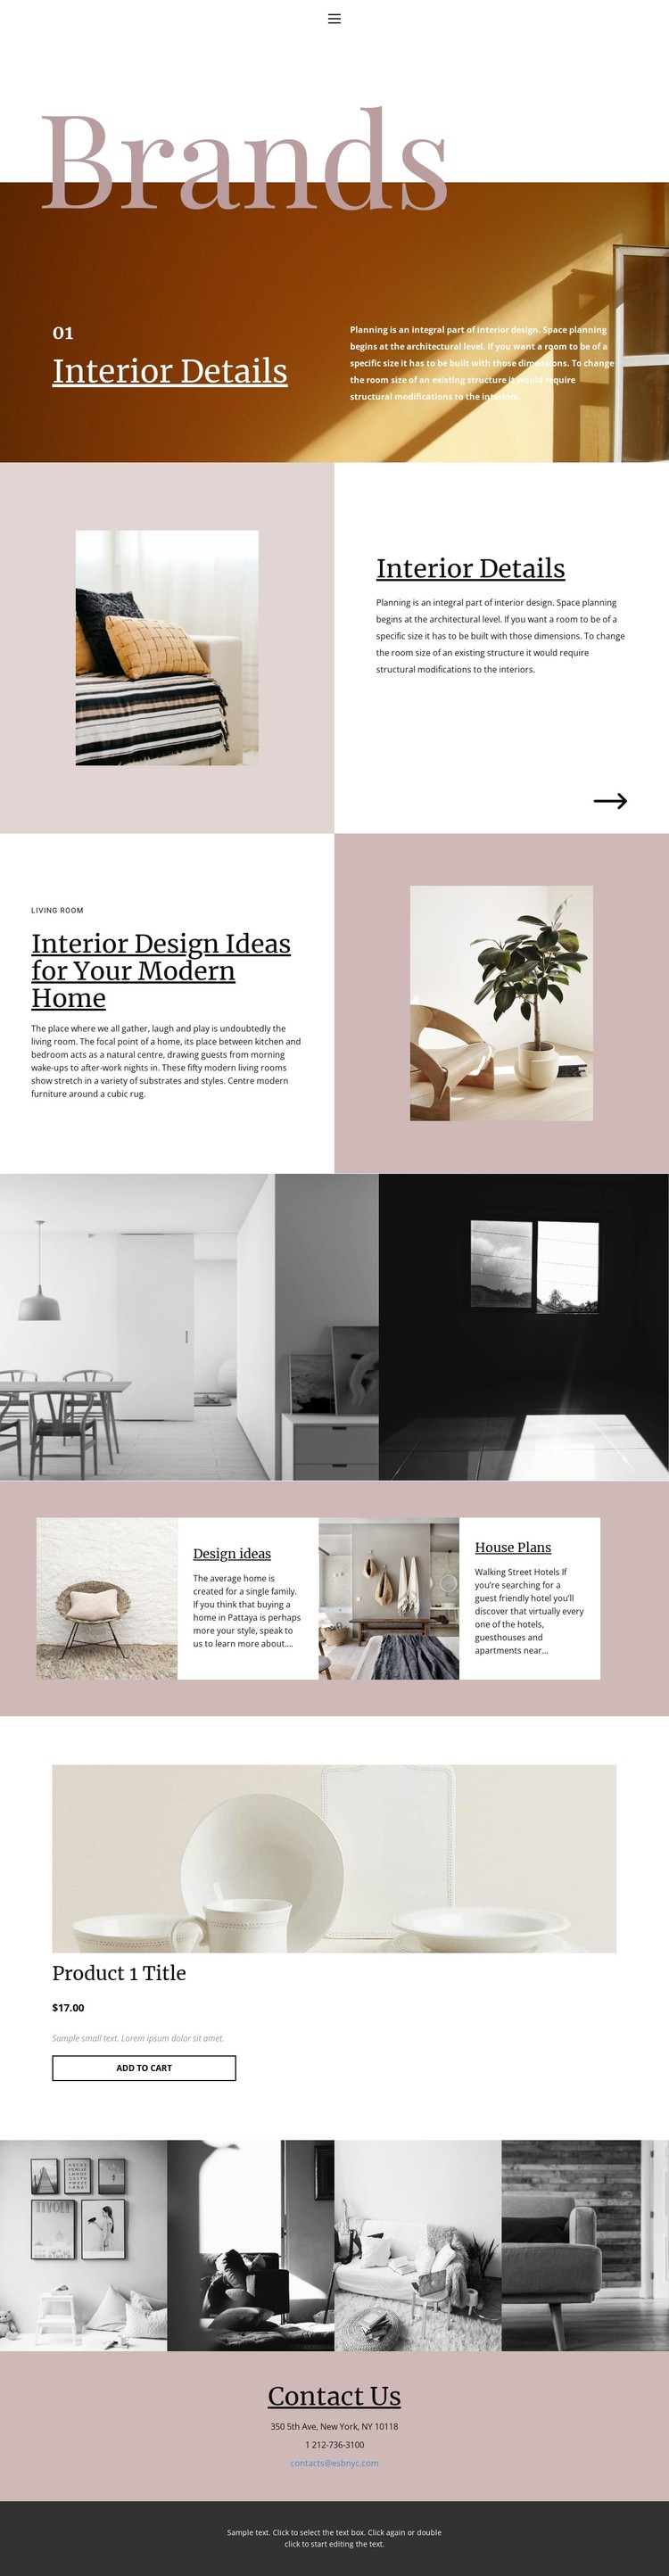 I am an interior designer Static Site Generator